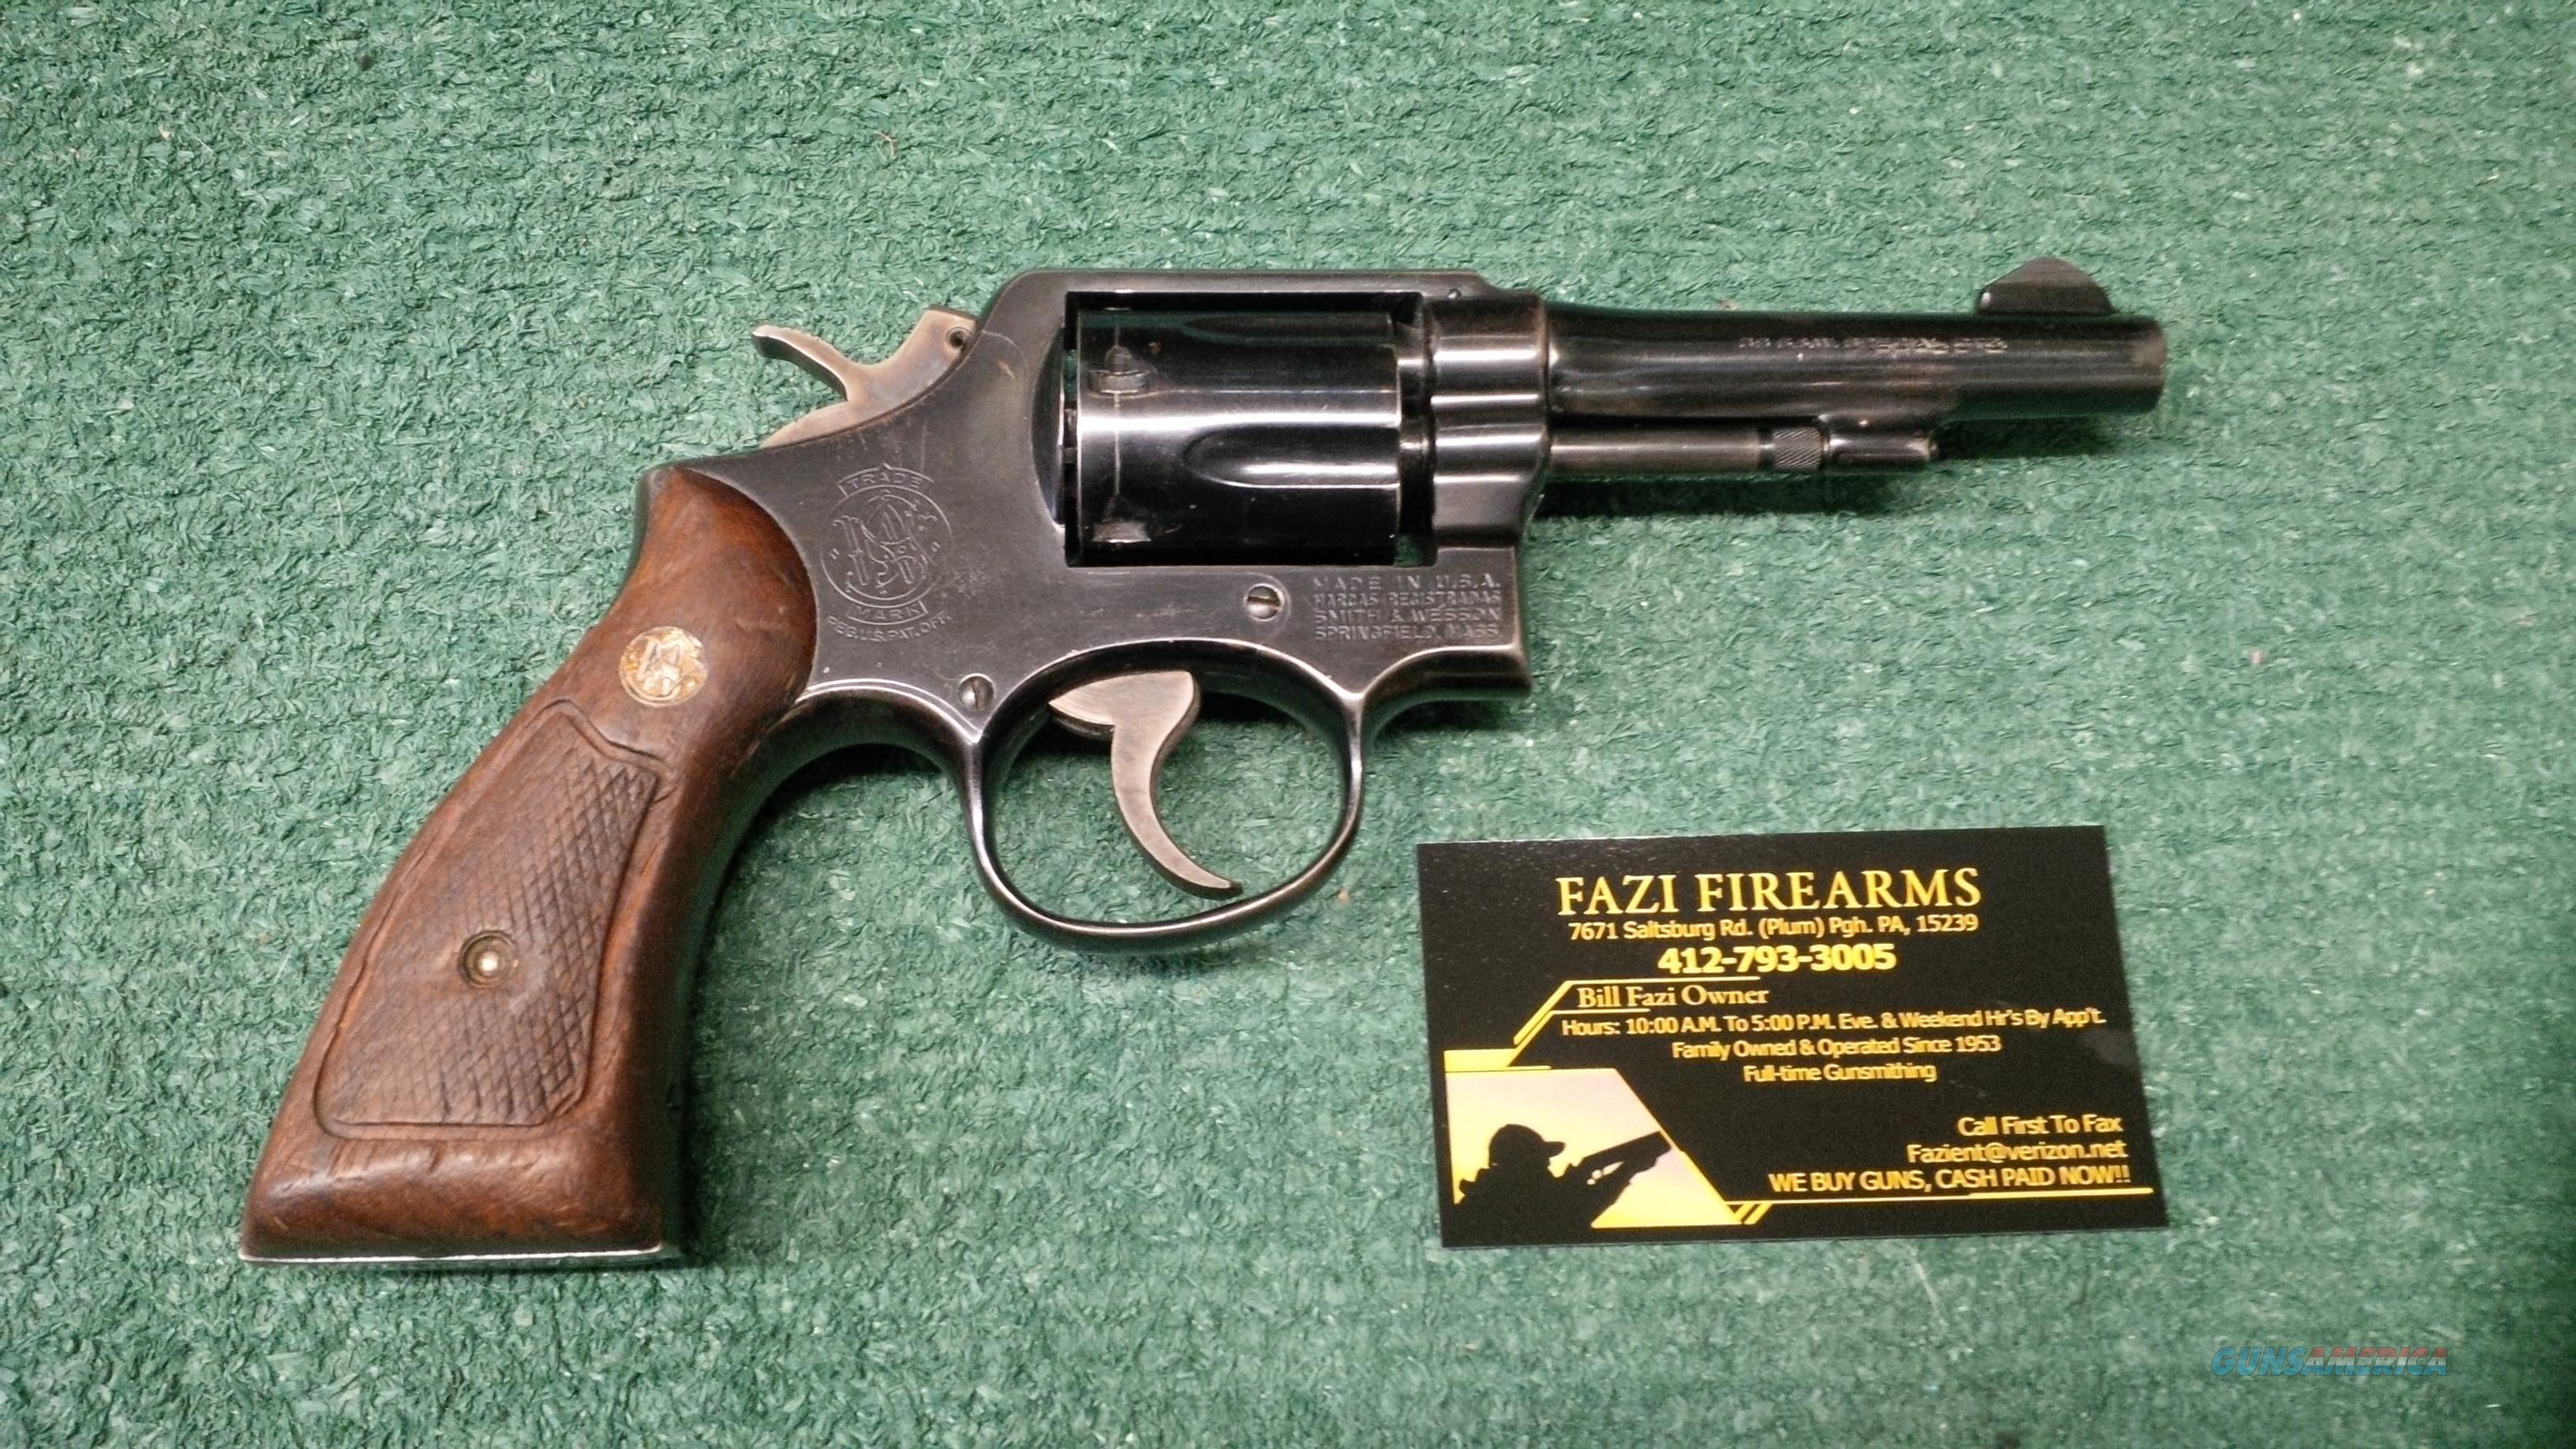 Smith & Wesson 10-5 .38 Special Revolver   Guns > Pistols > Smith & Wesson Revolvers > Med. Frame ( K/L )